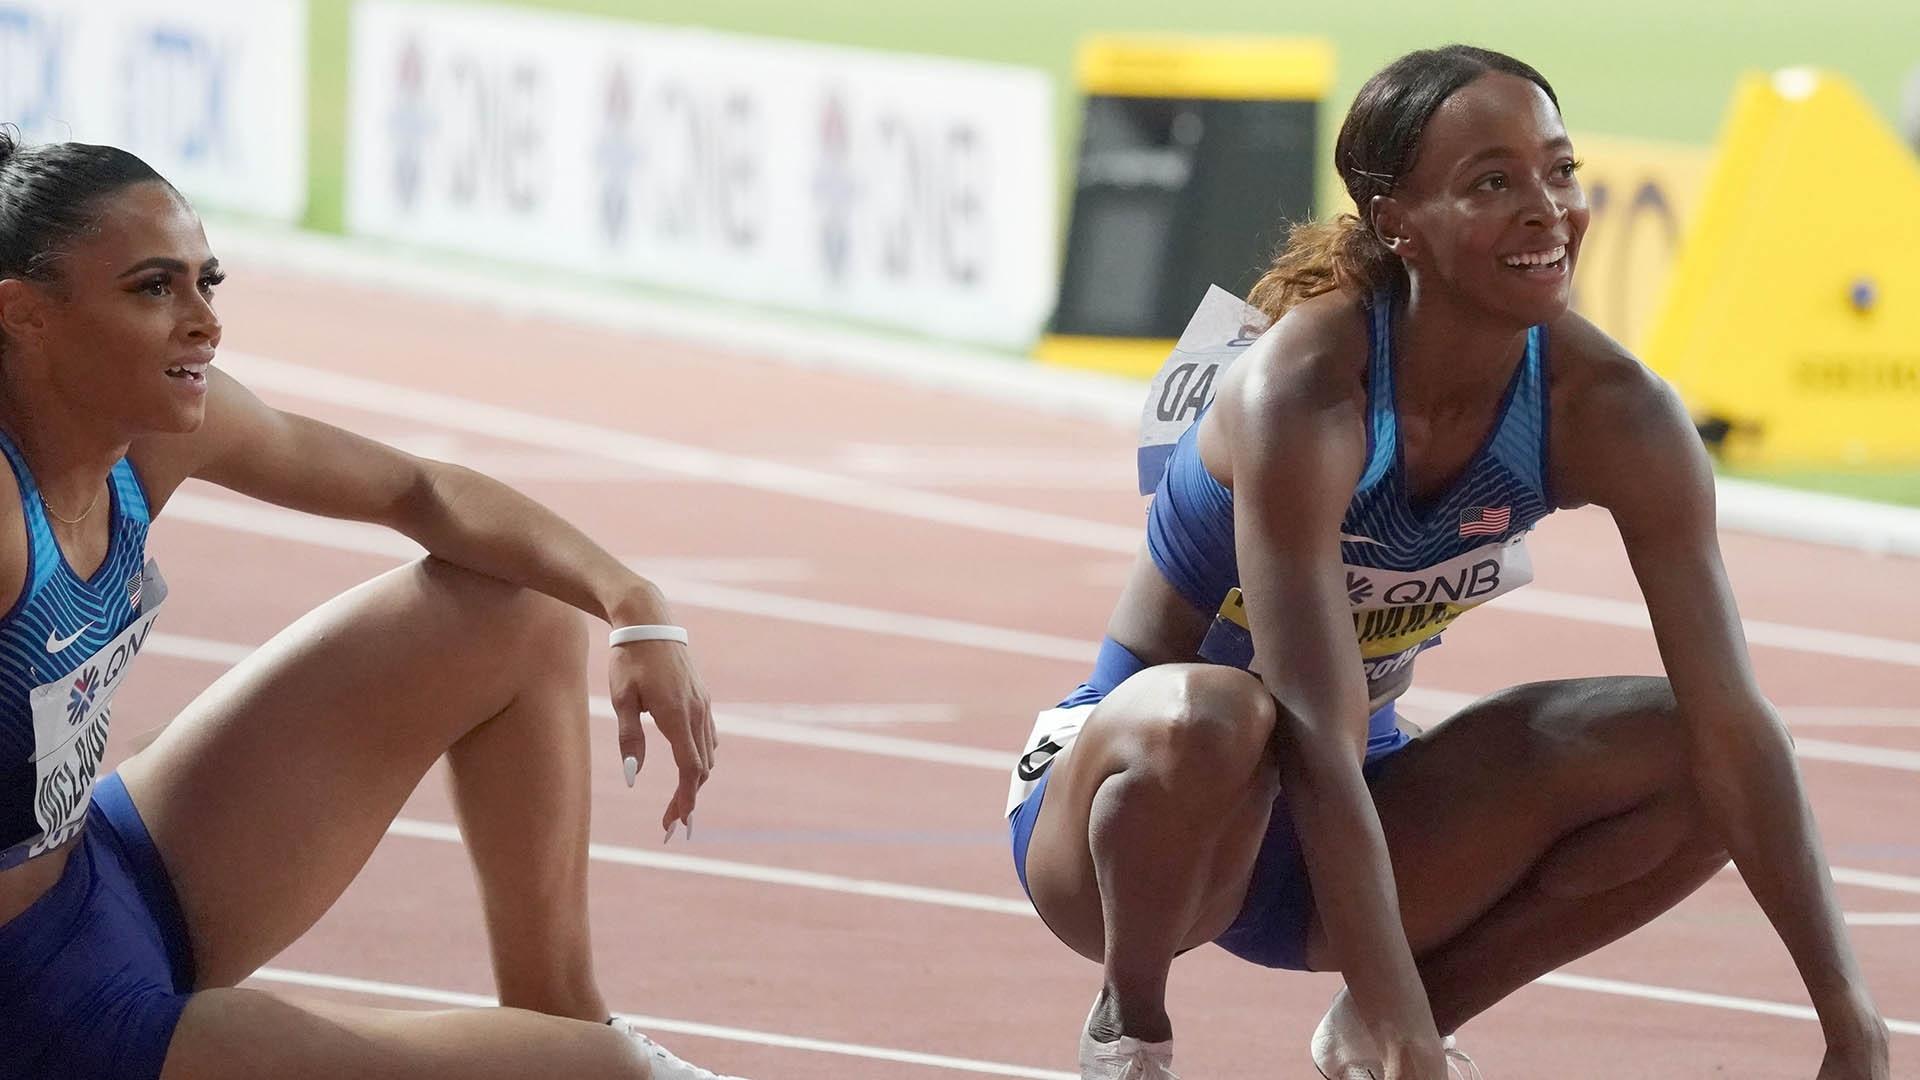 Dalilah Muhammad and Sydney McLaughlin at 2019 Worlds